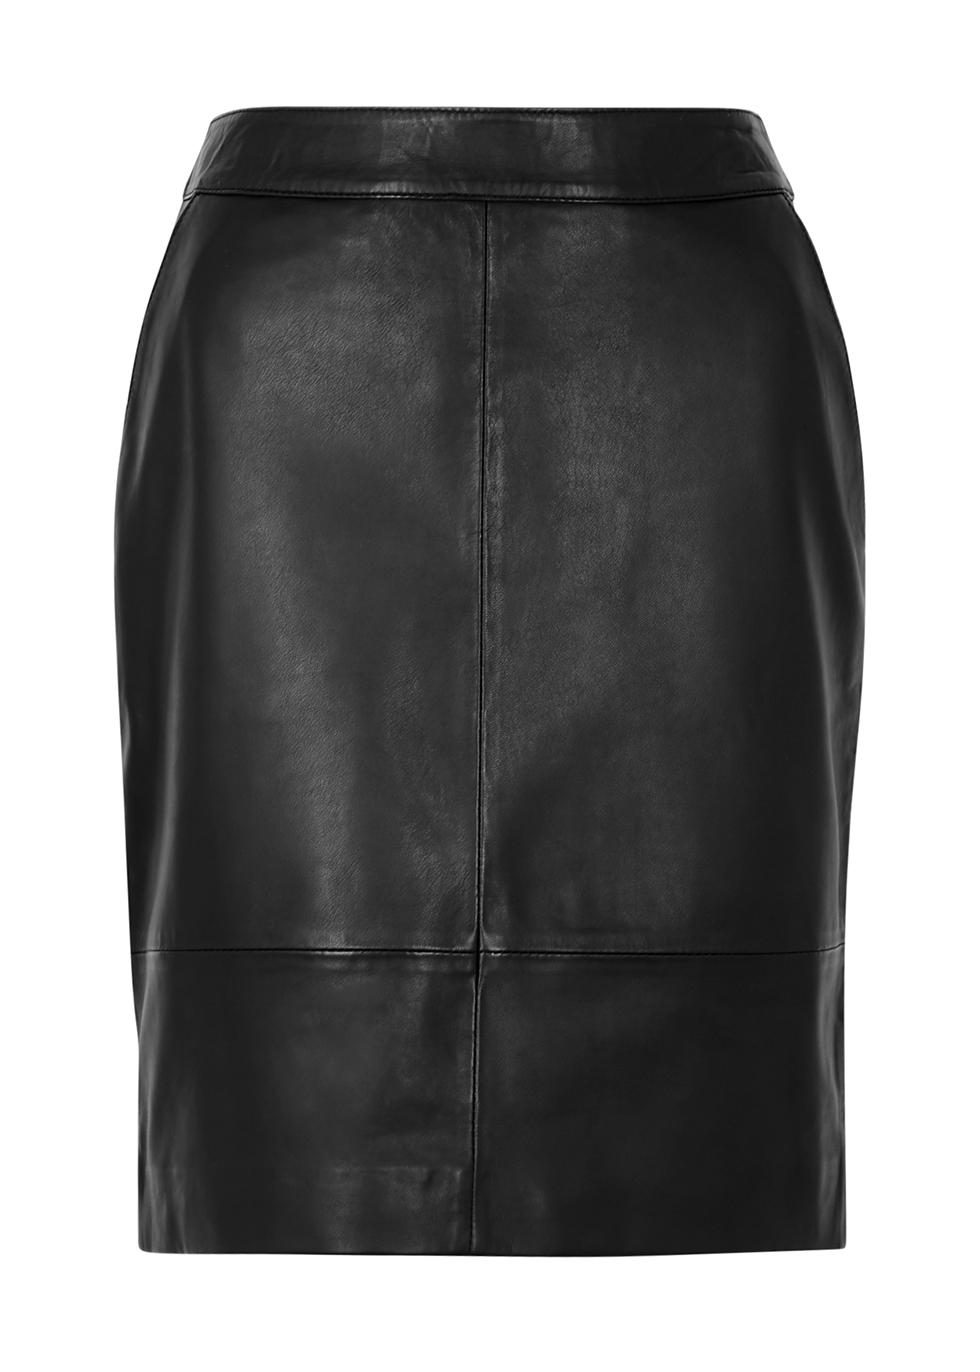 Char black leather mini skirt